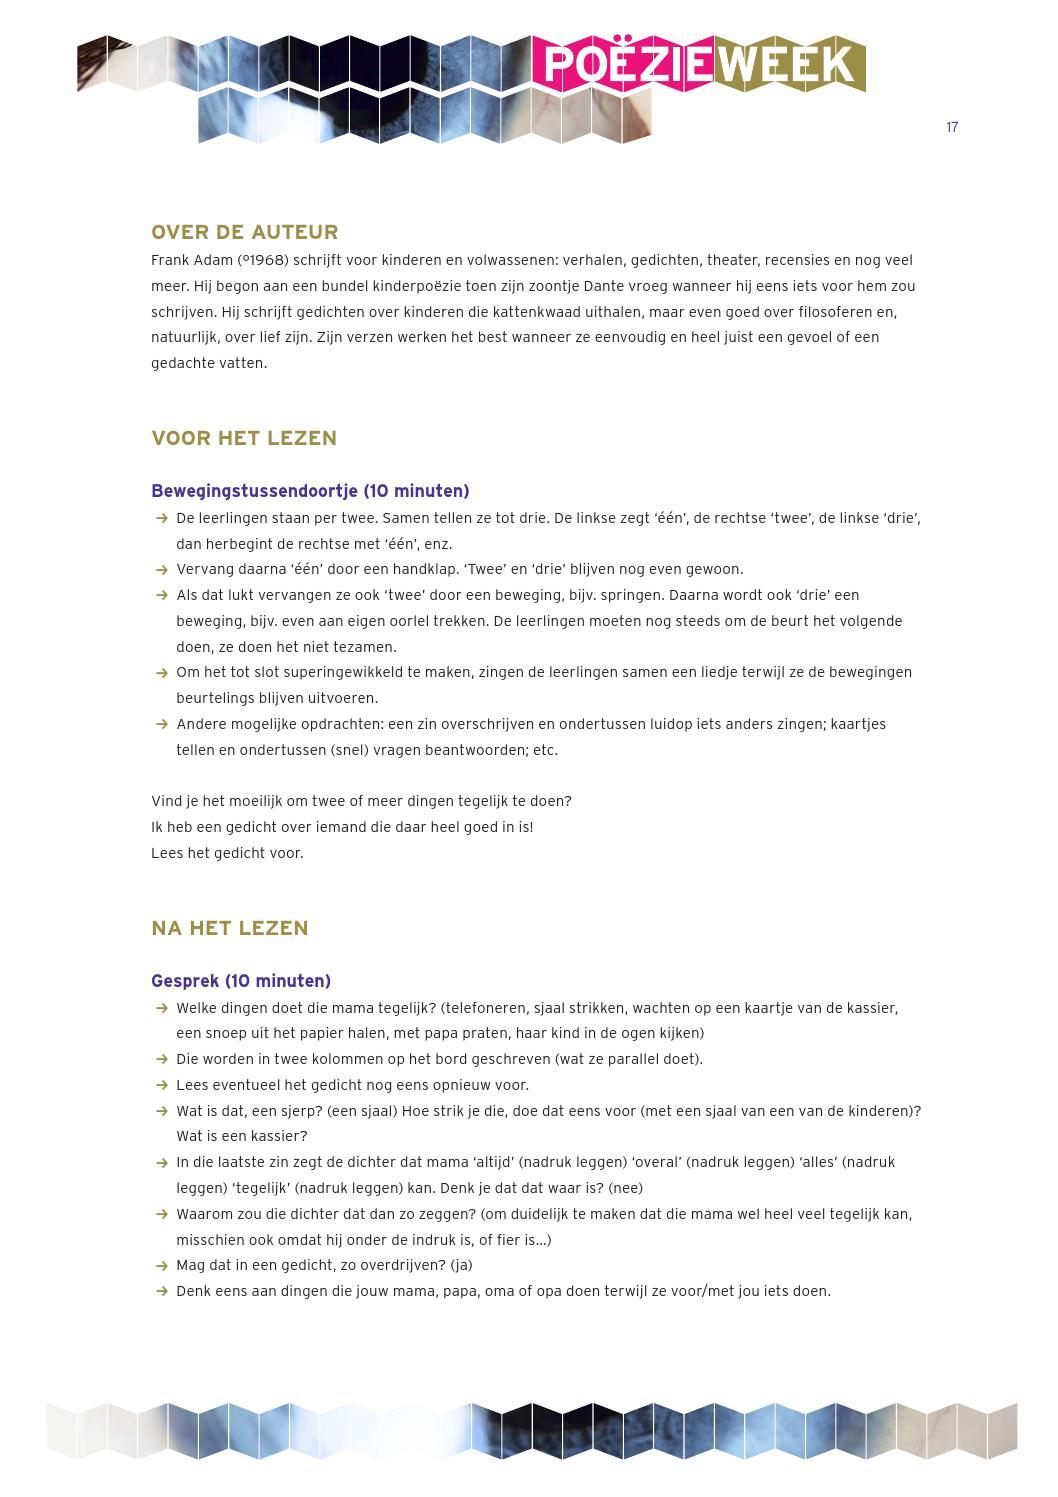 Poëzielessen Voor Basisscholen 2014 Versie 3 By Stichting